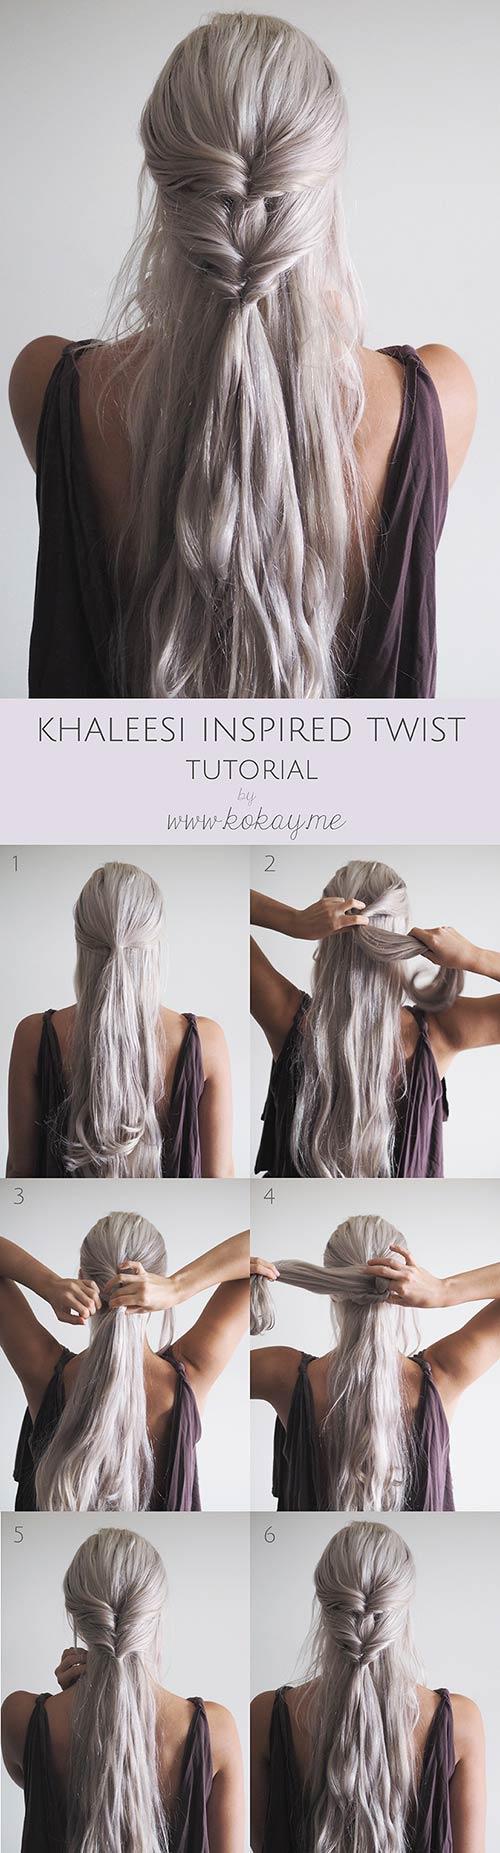 4. Khaleesi Inspired Twist